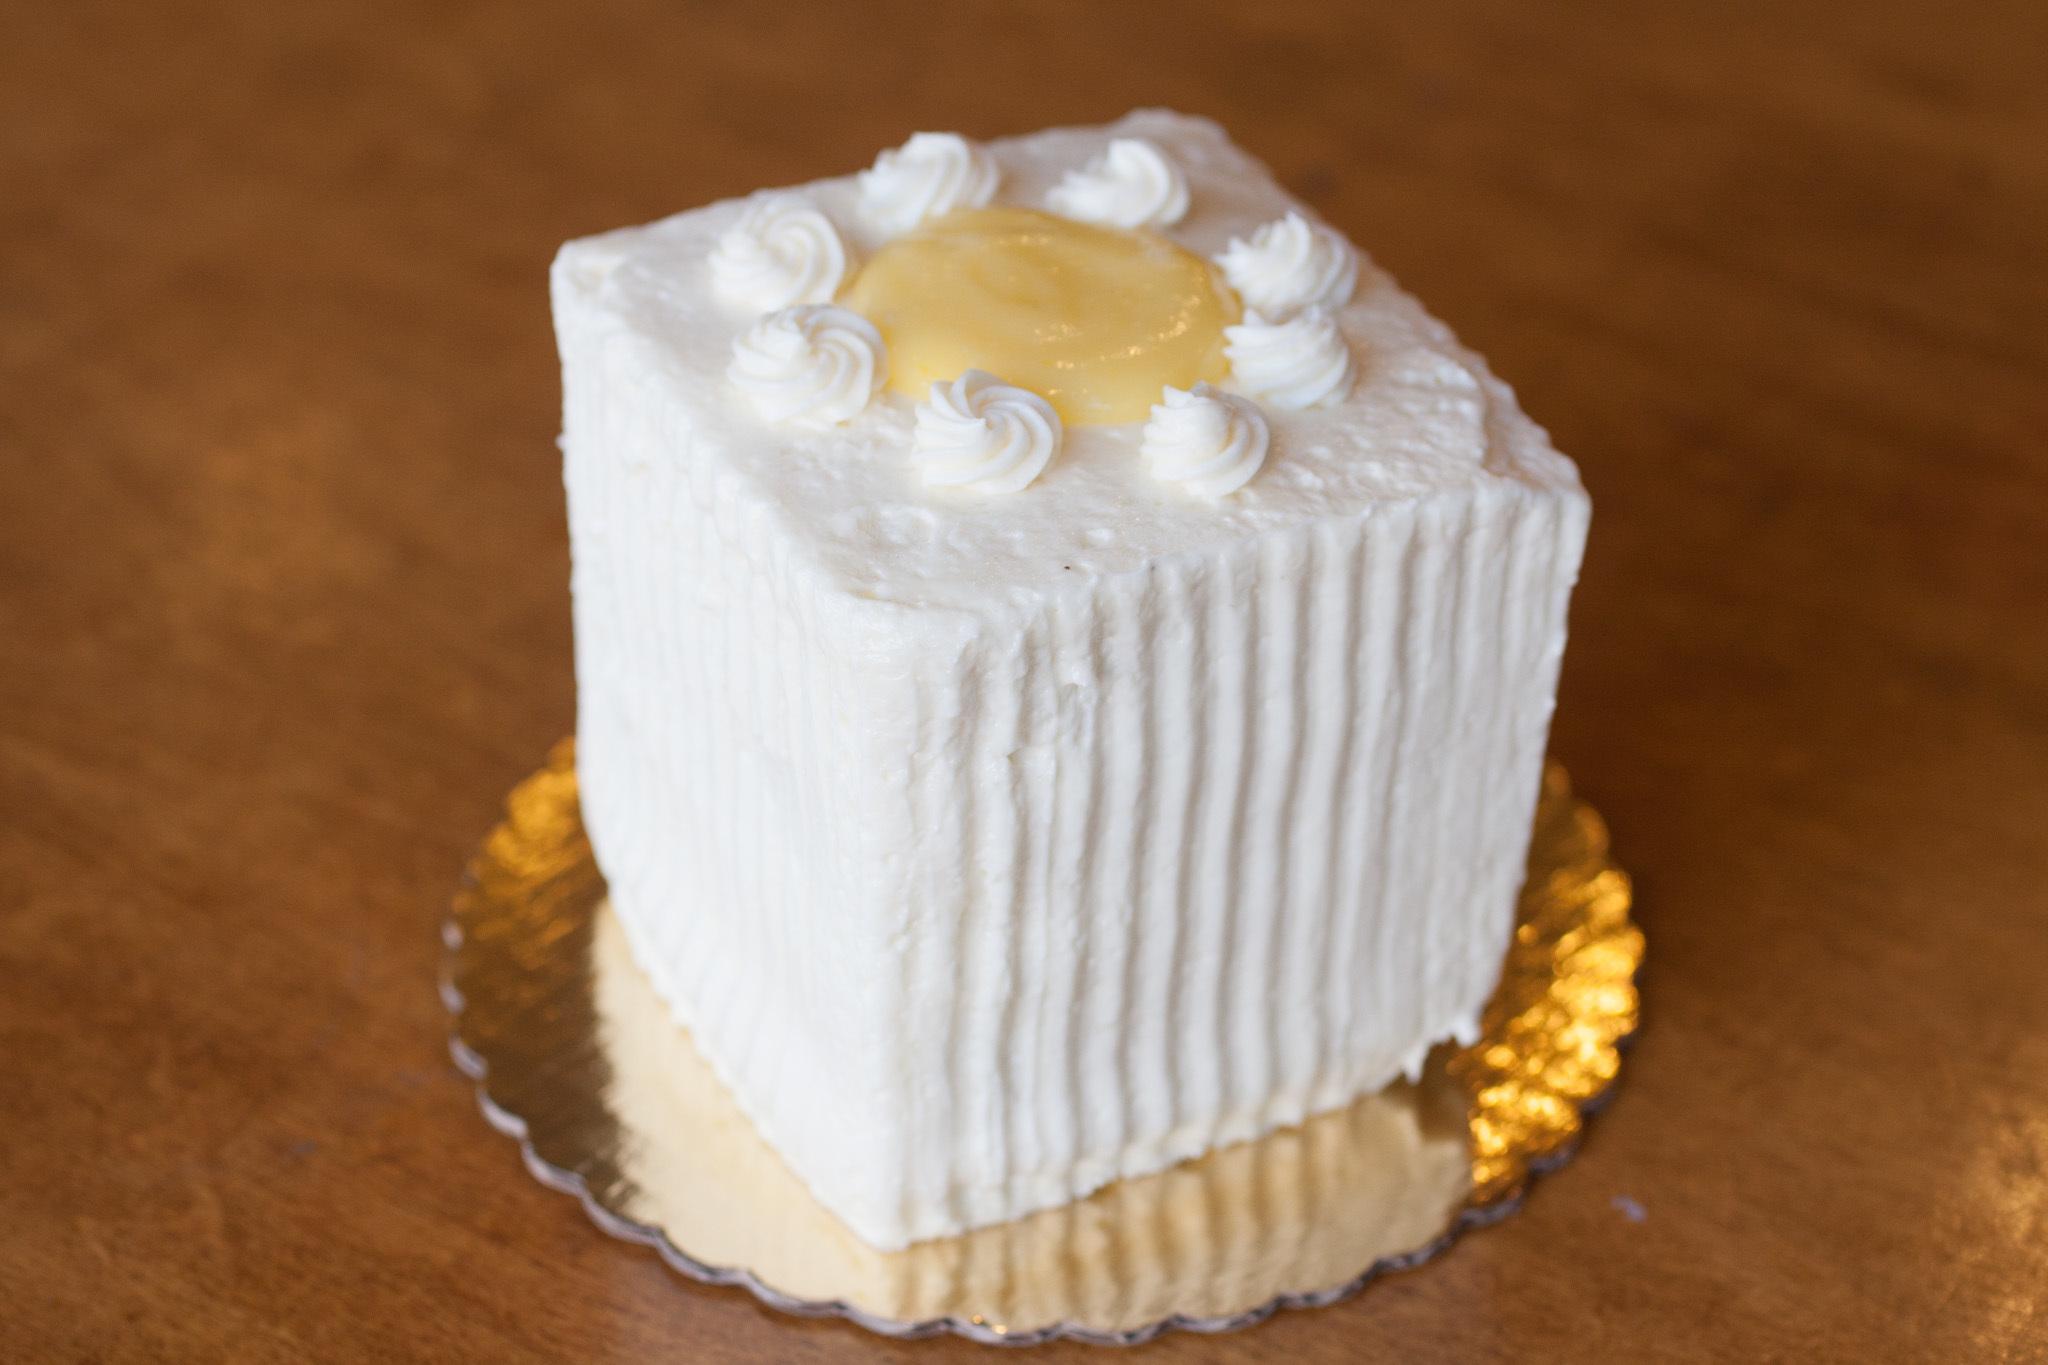 Loretta's Bake Shop & Café